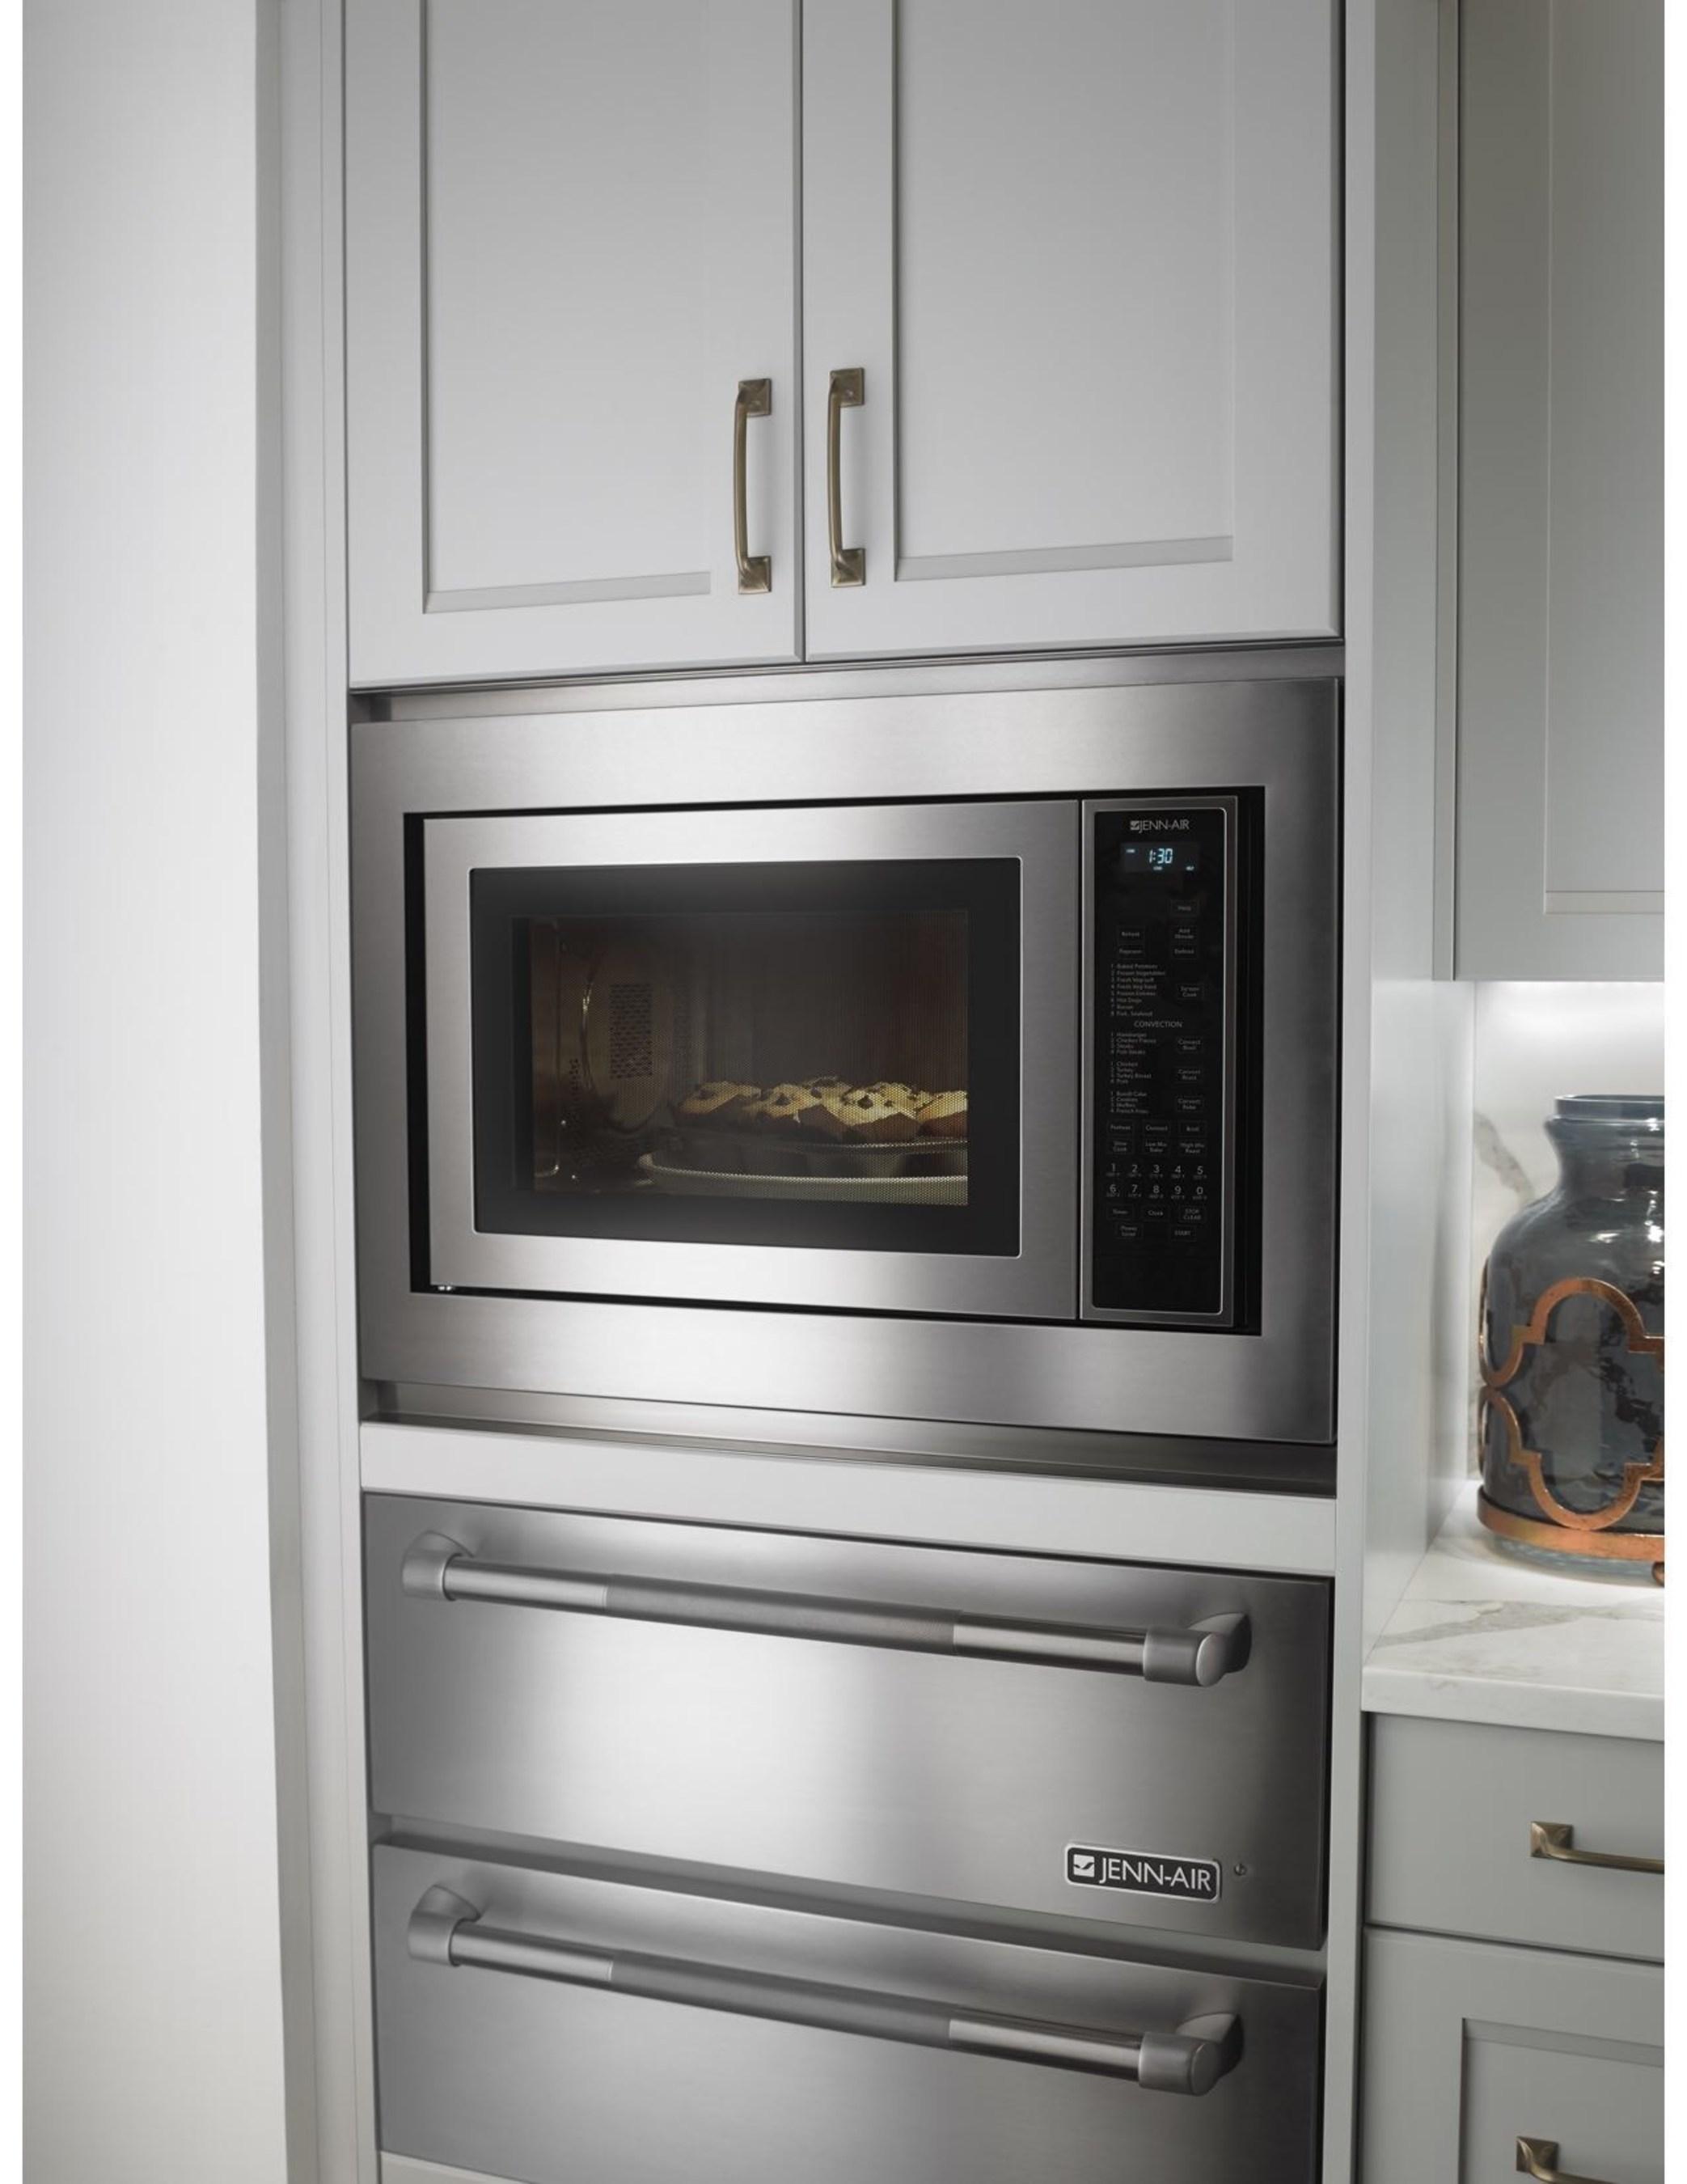 Jenn Air Microwave >> Flush Installation An Option On New Jenn Air Built In